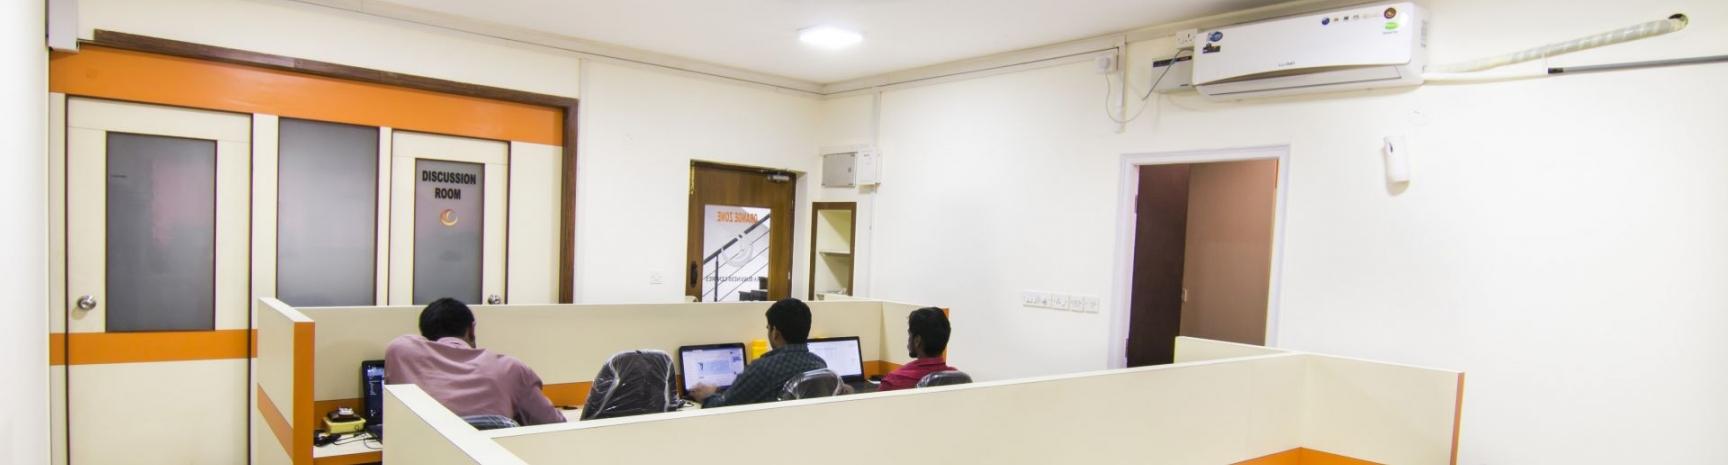 ATAURA BUSINESS CENTERS, Bengaluru - Read Reviews & Book Online